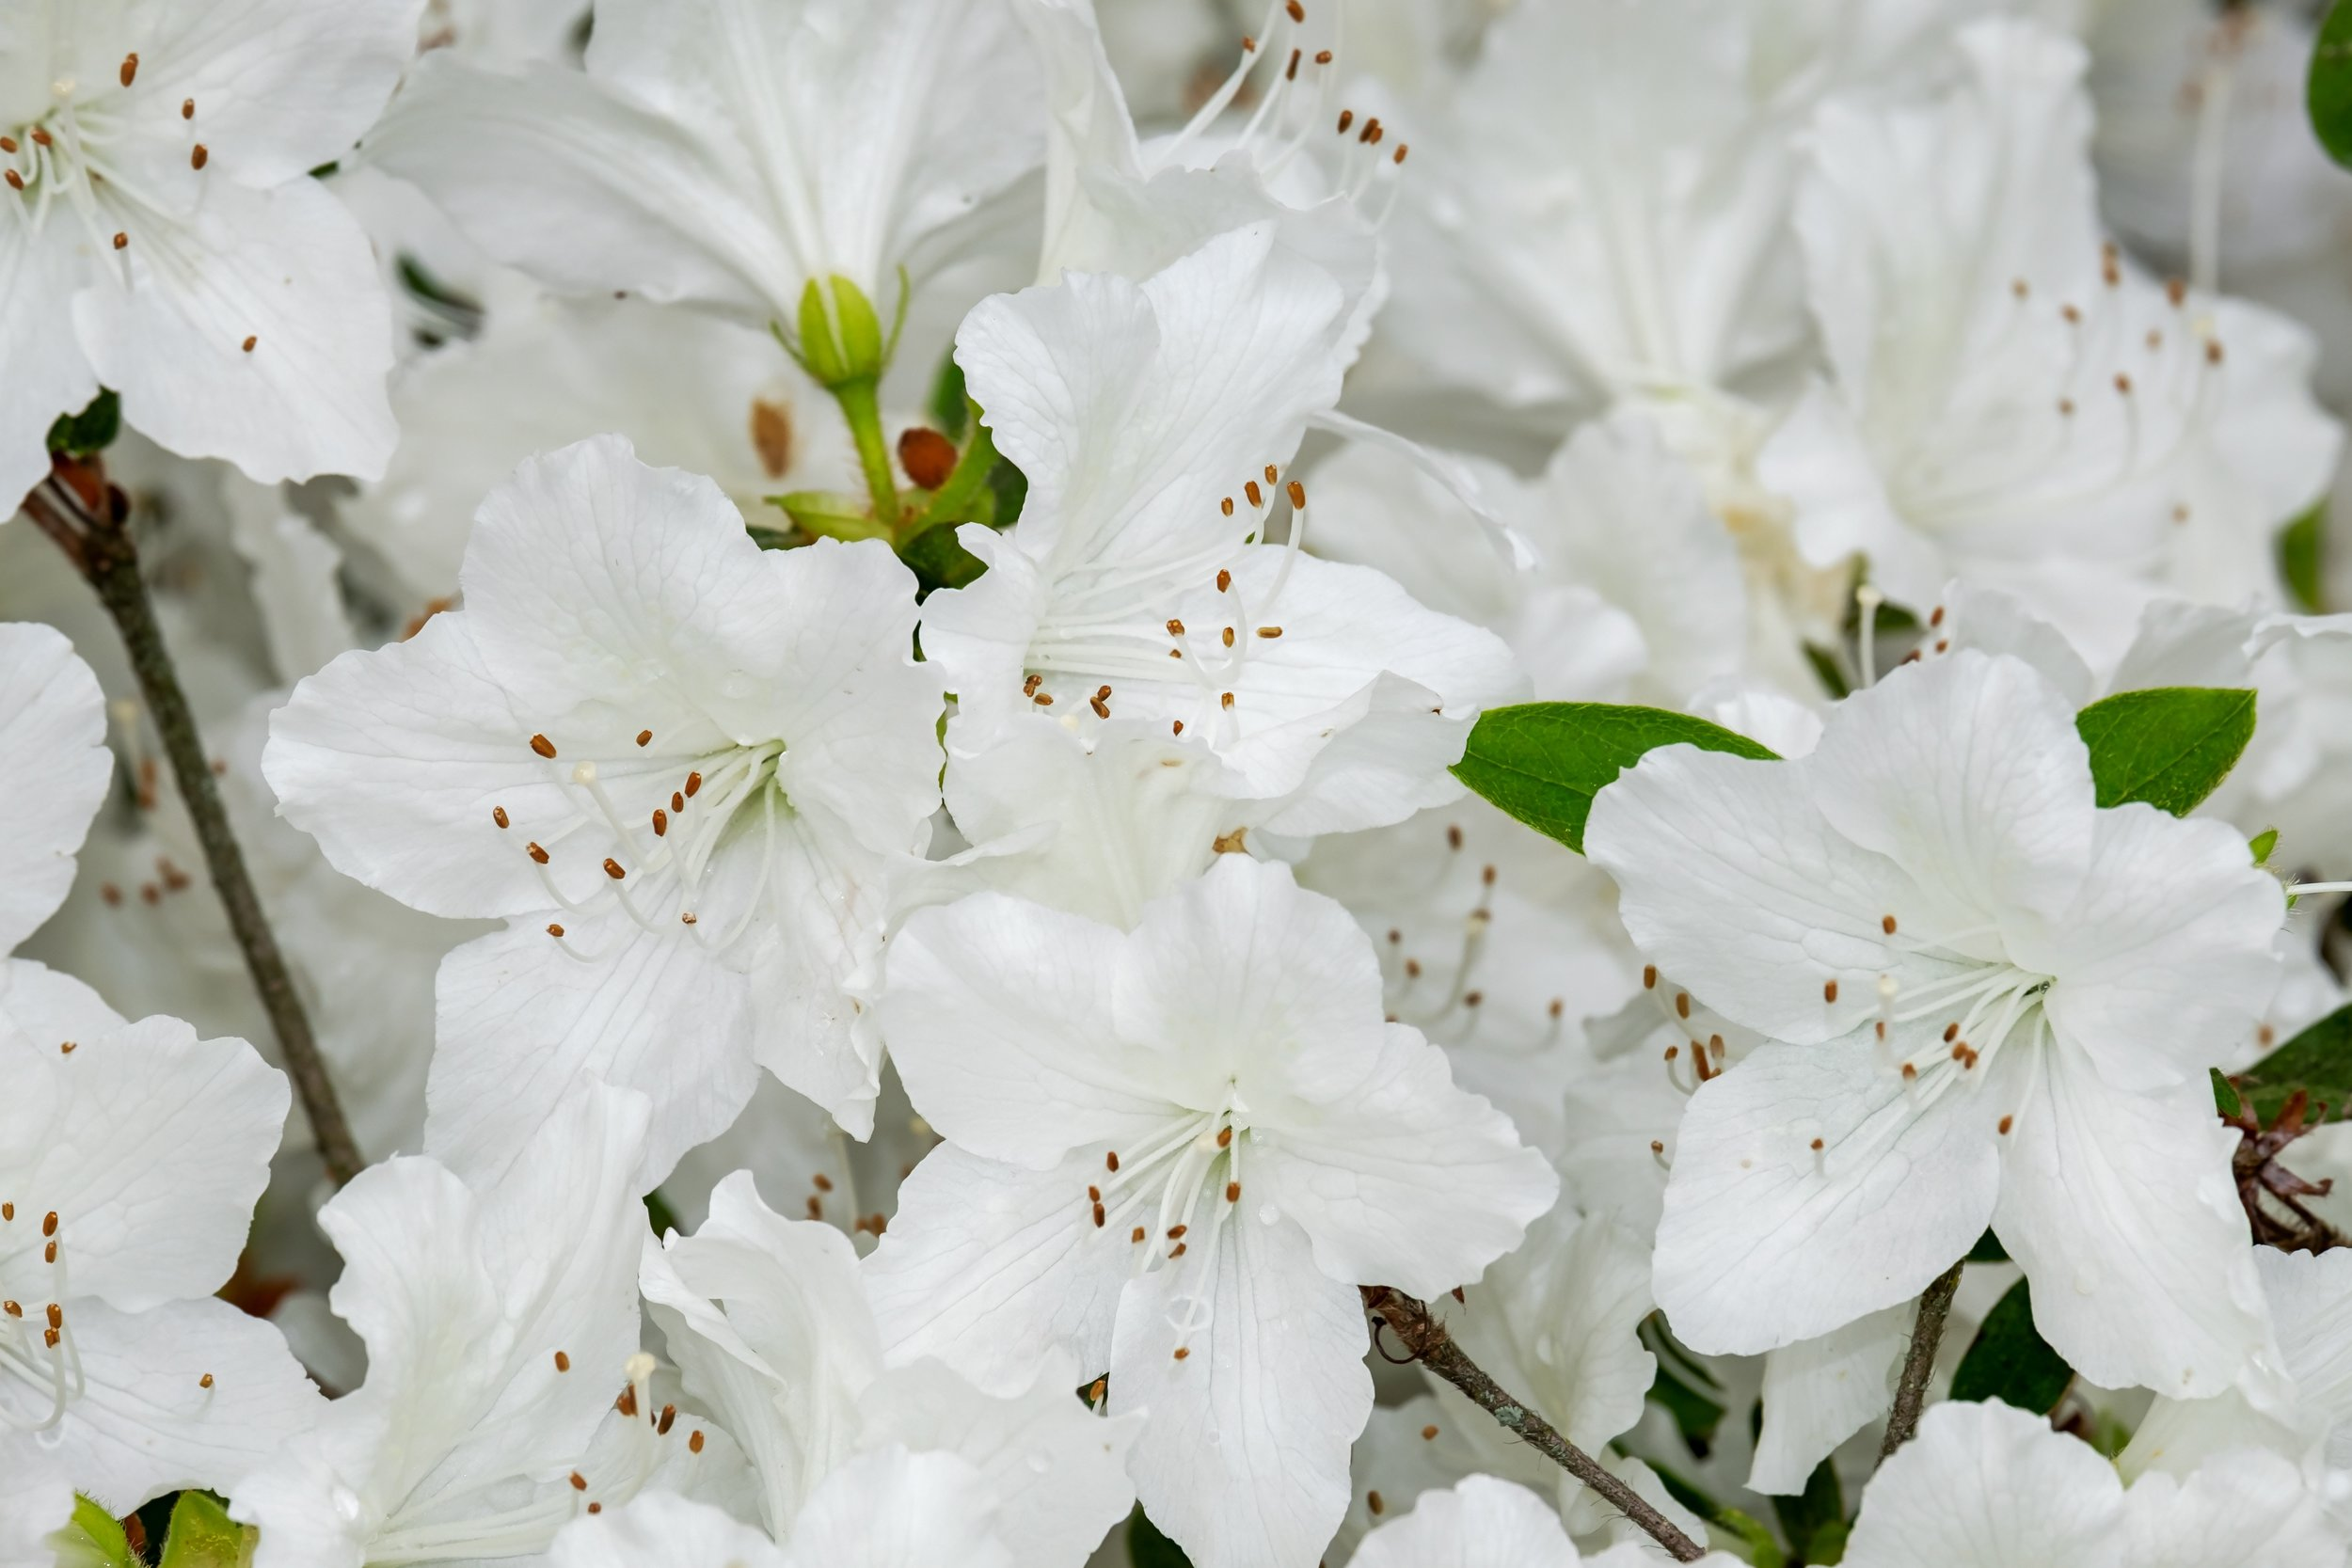 azalea-3387734.jpg